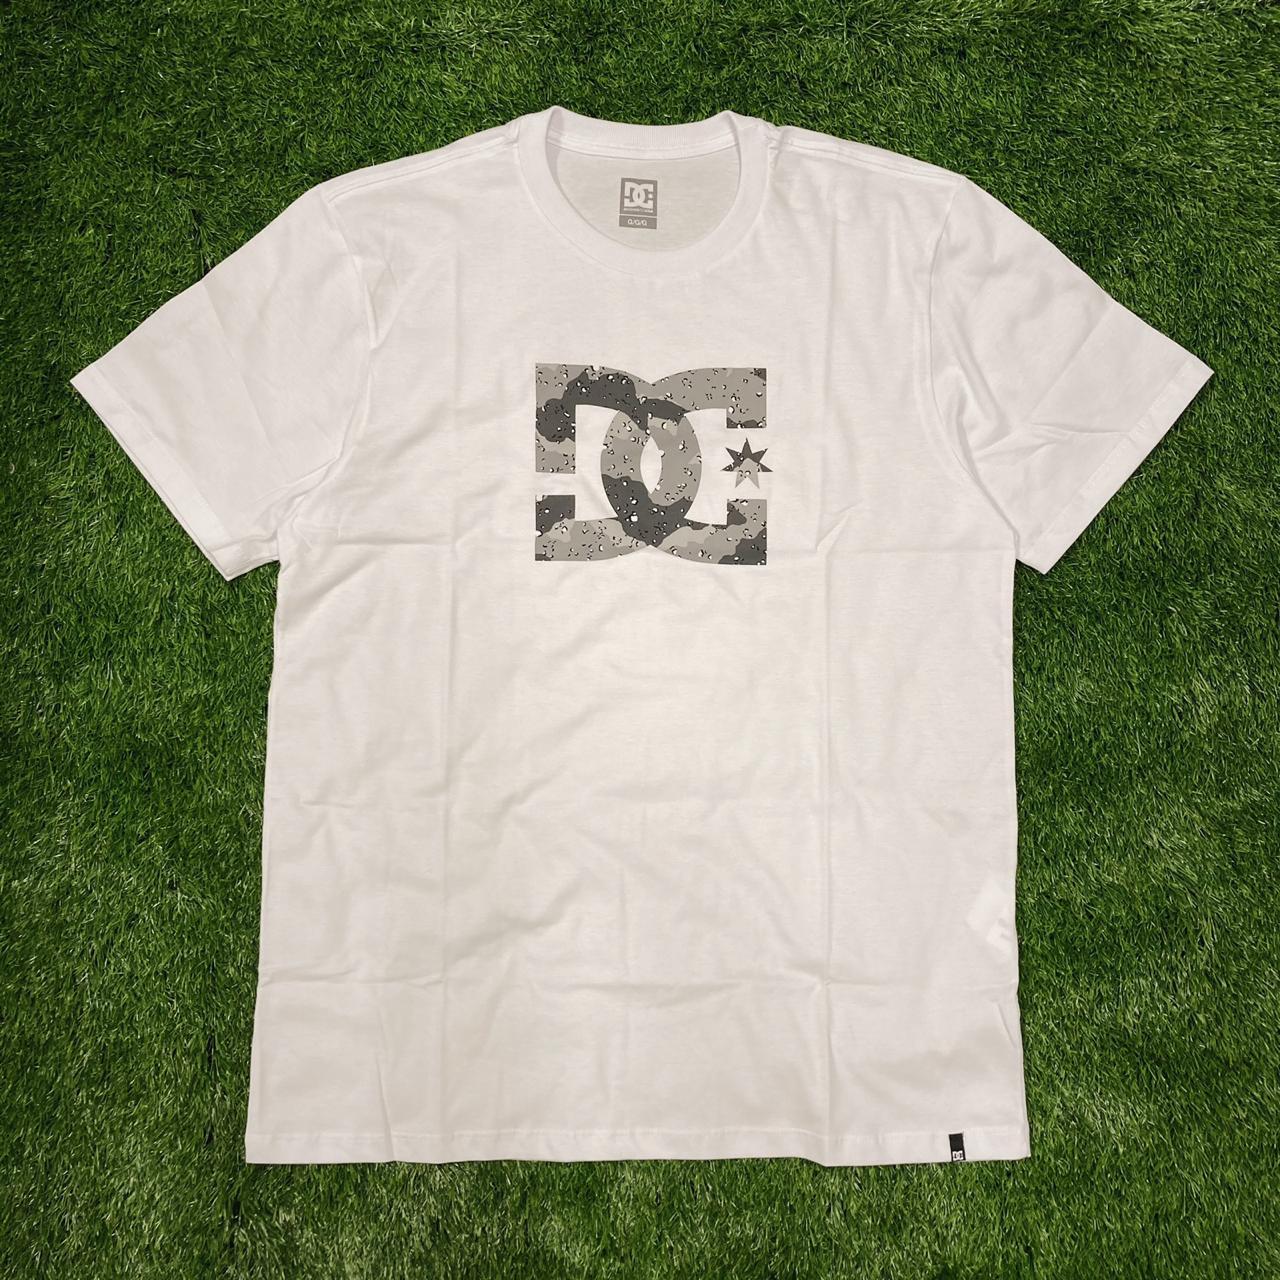 Camiseta dc star camo white